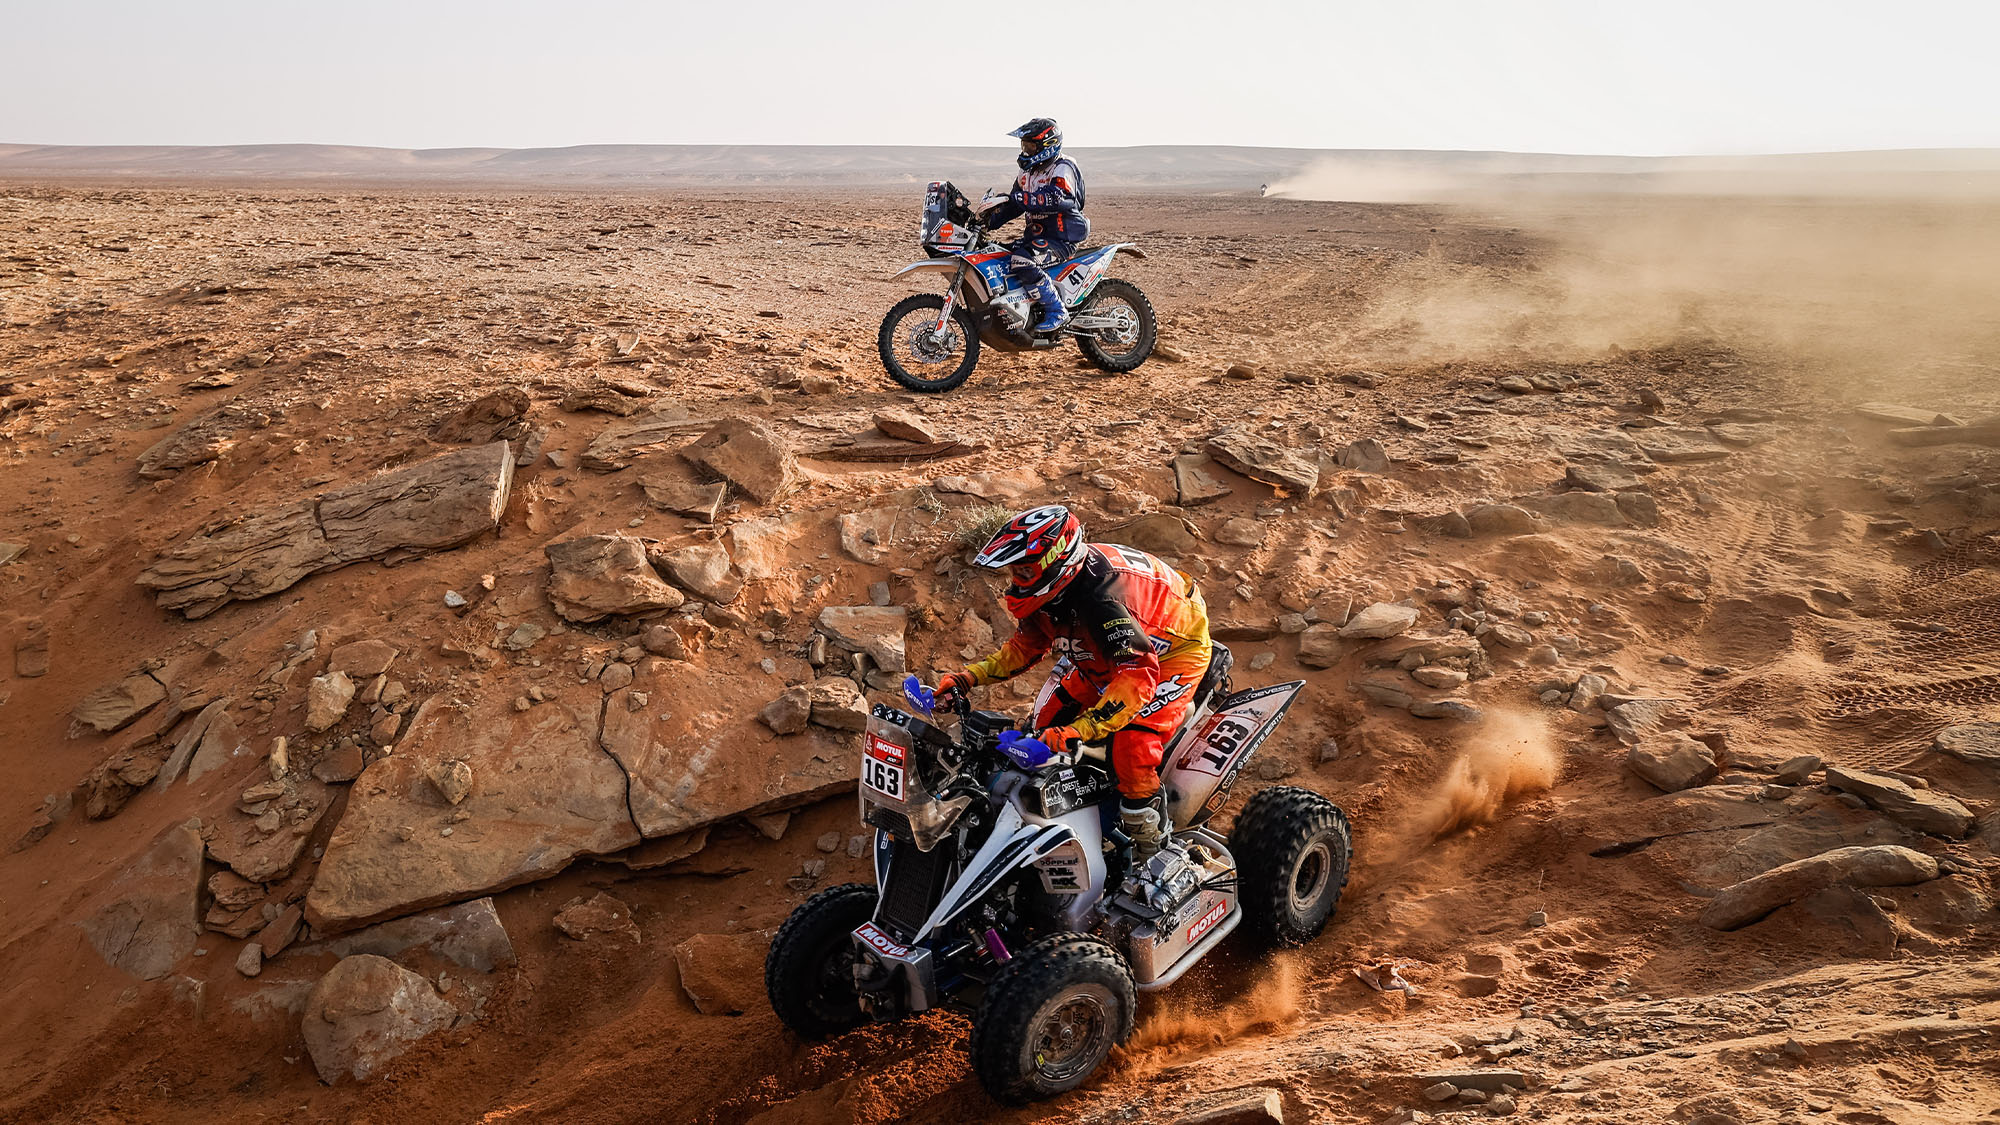 163 Copetti Pablo (usa), Yamaha, MX Devesa By Berta, Motul, Quad, action during the 8th stage of the Dakar 2021 between Sakaka and Neom, in Saudi Arabia on January 11, 2021